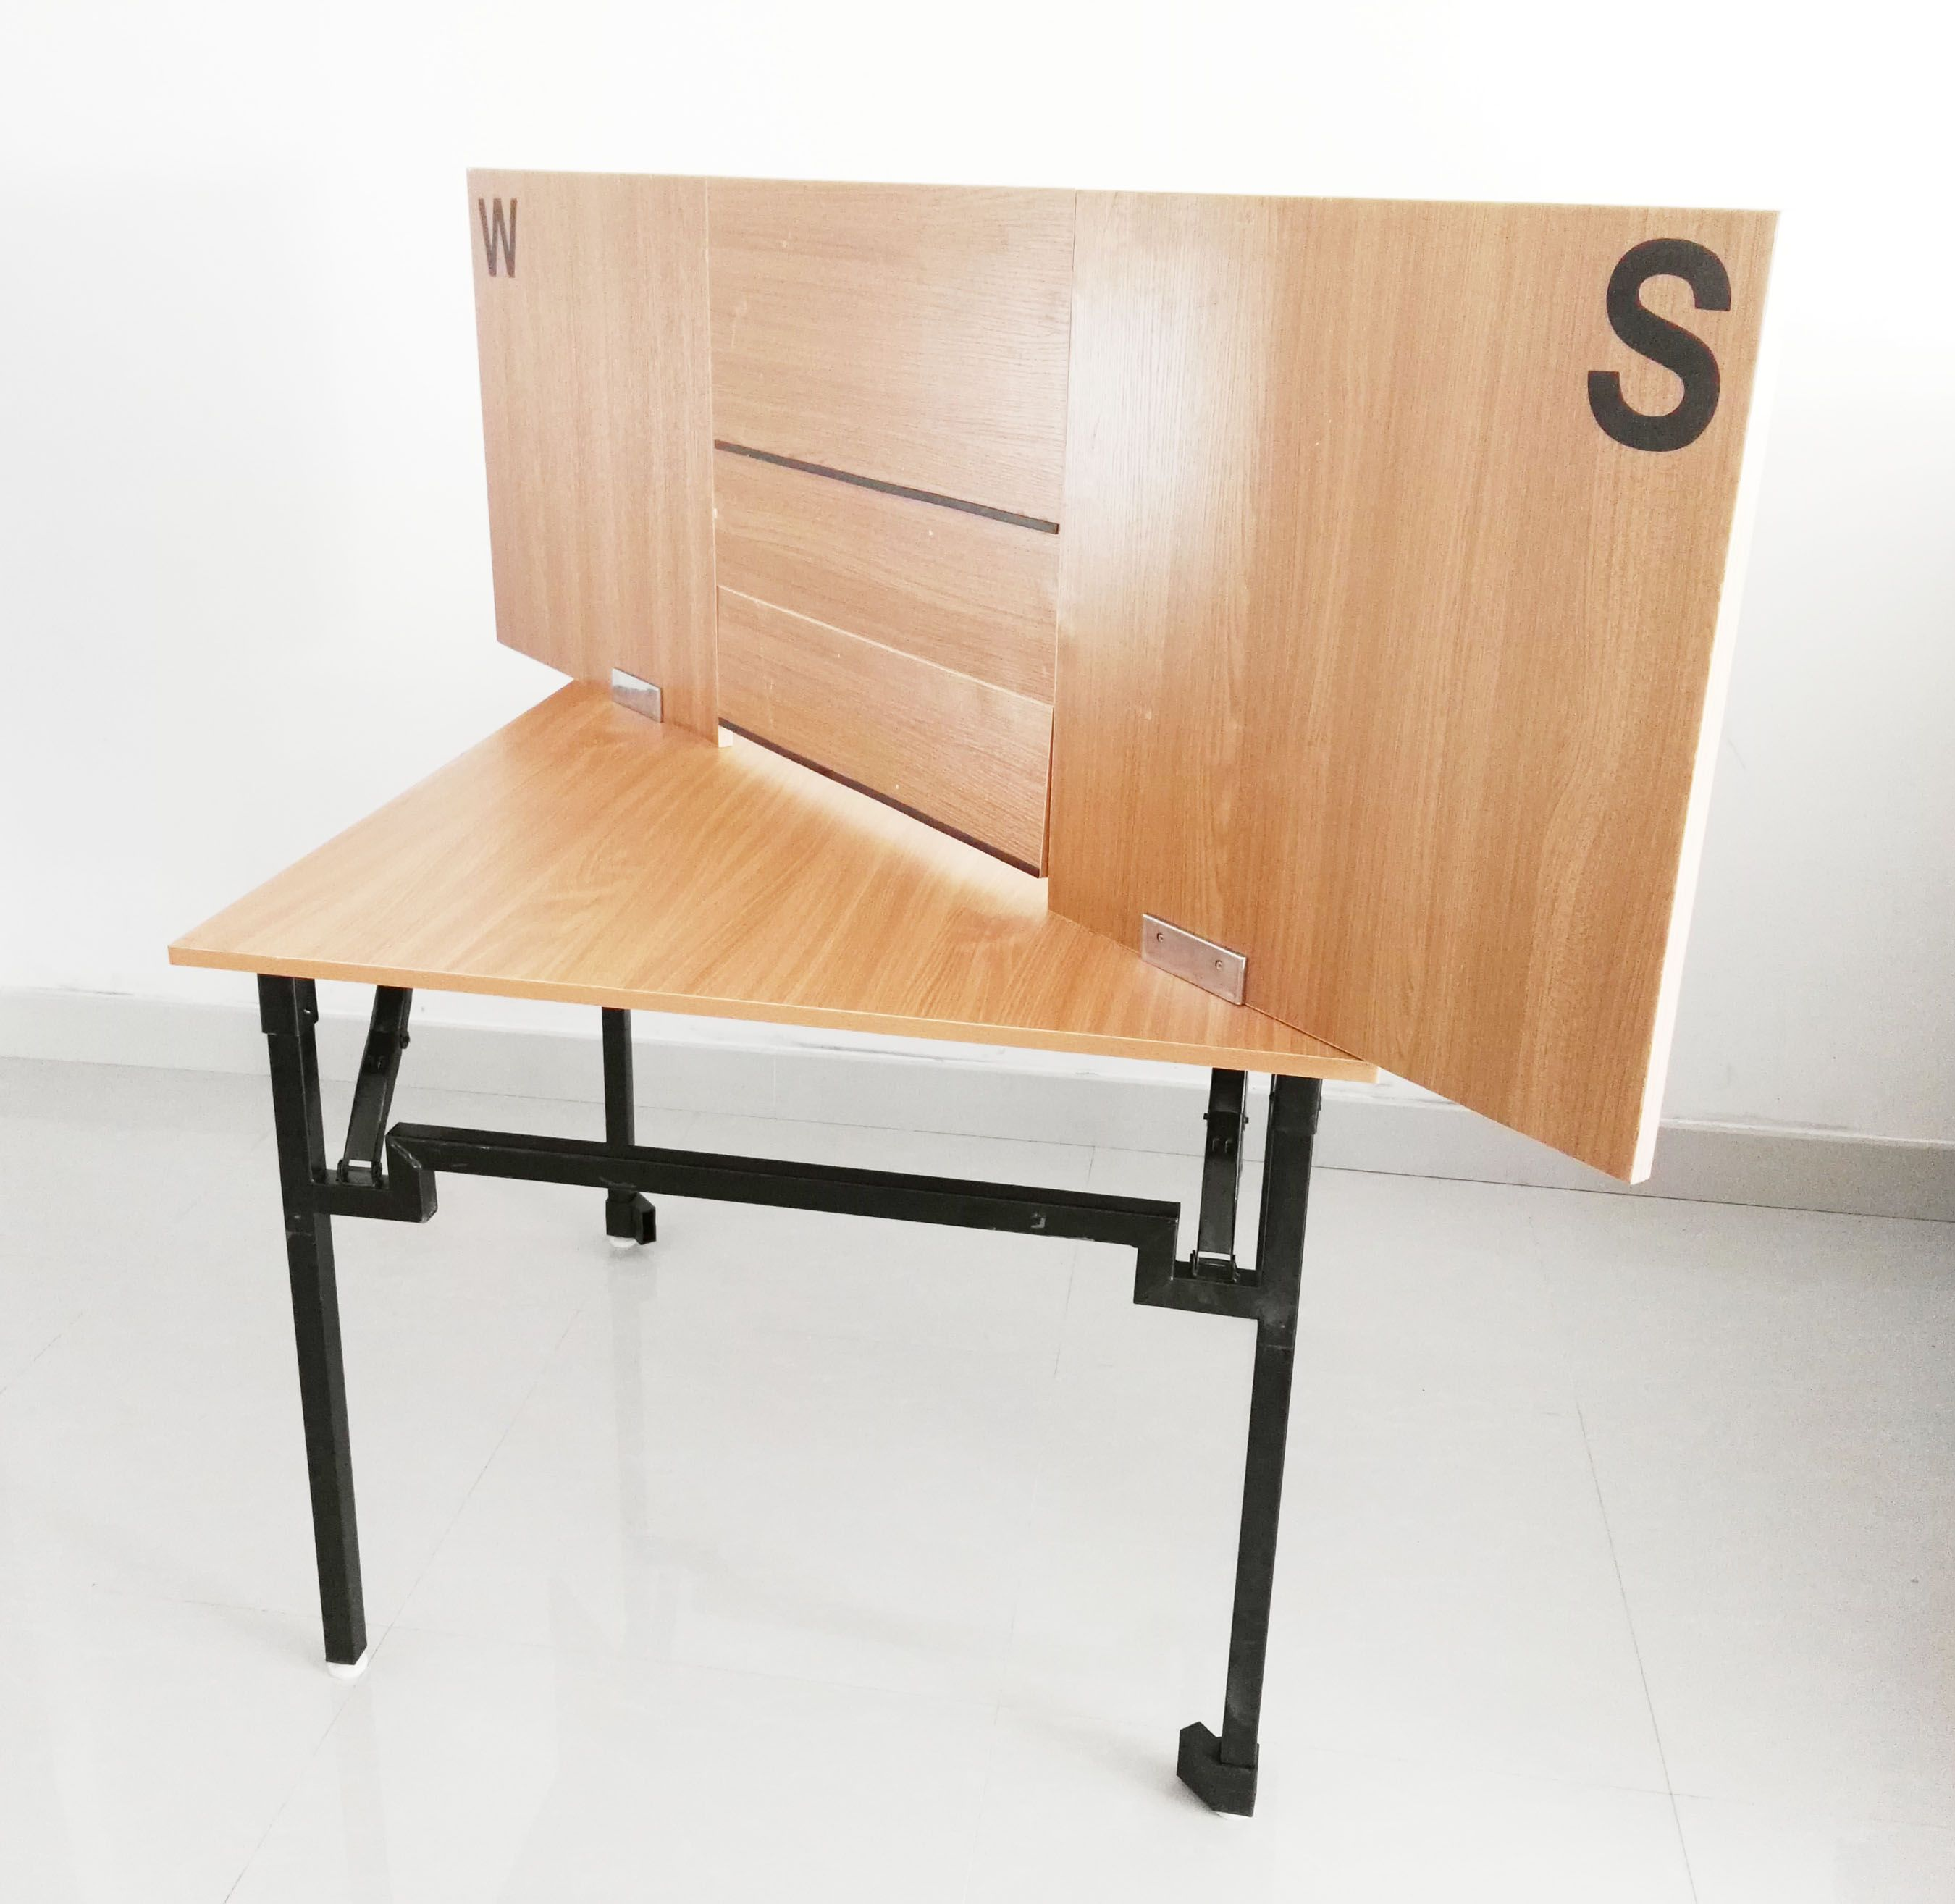 Foldable screen for bridge tablenormally for bridge club